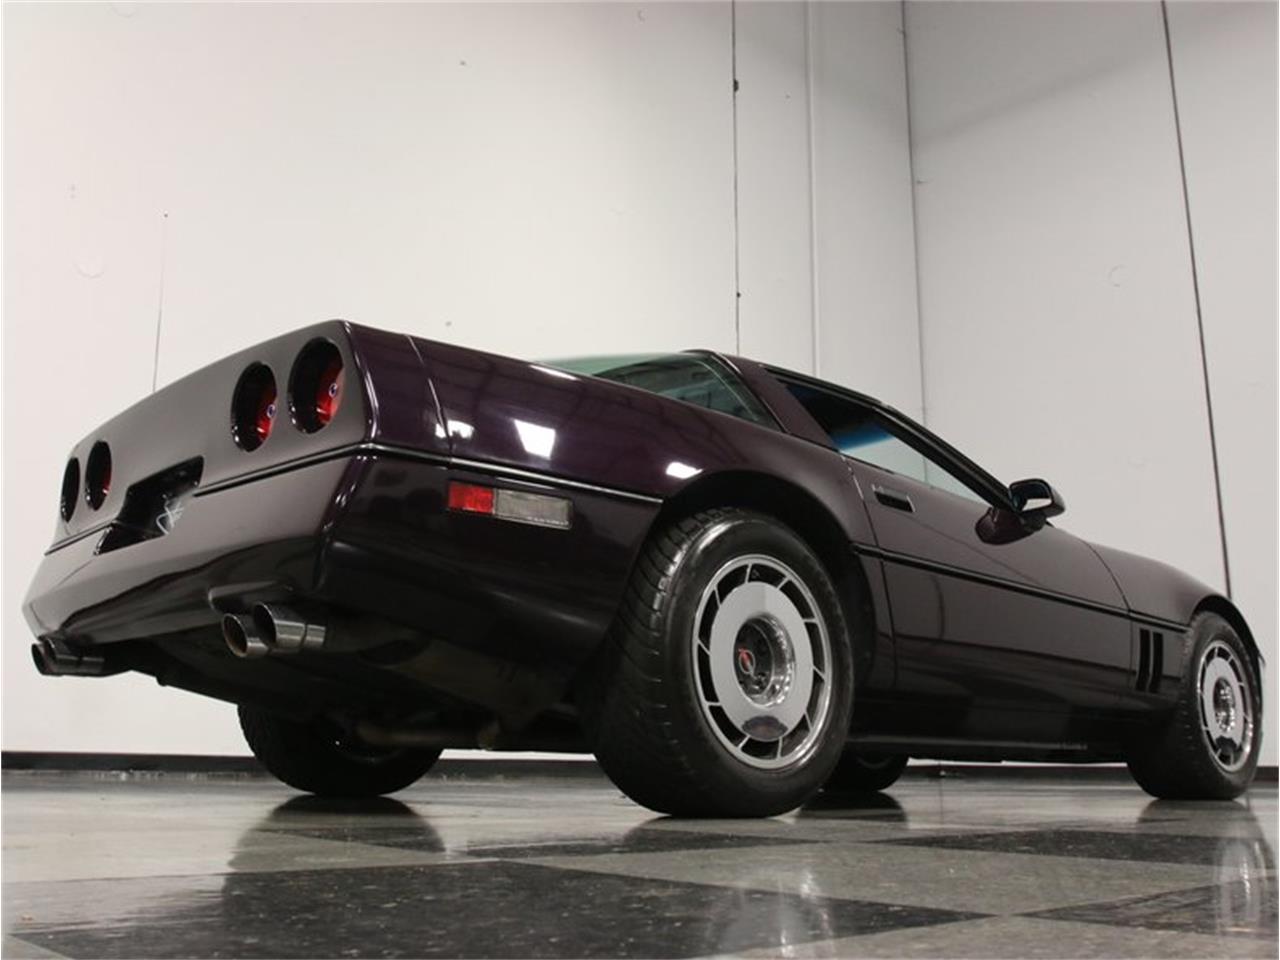 Large Picture of '85 Chevrolet Corvette located in Georgia - $14,995.00 Offered by Streetside Classics - Atlanta - FPQQ